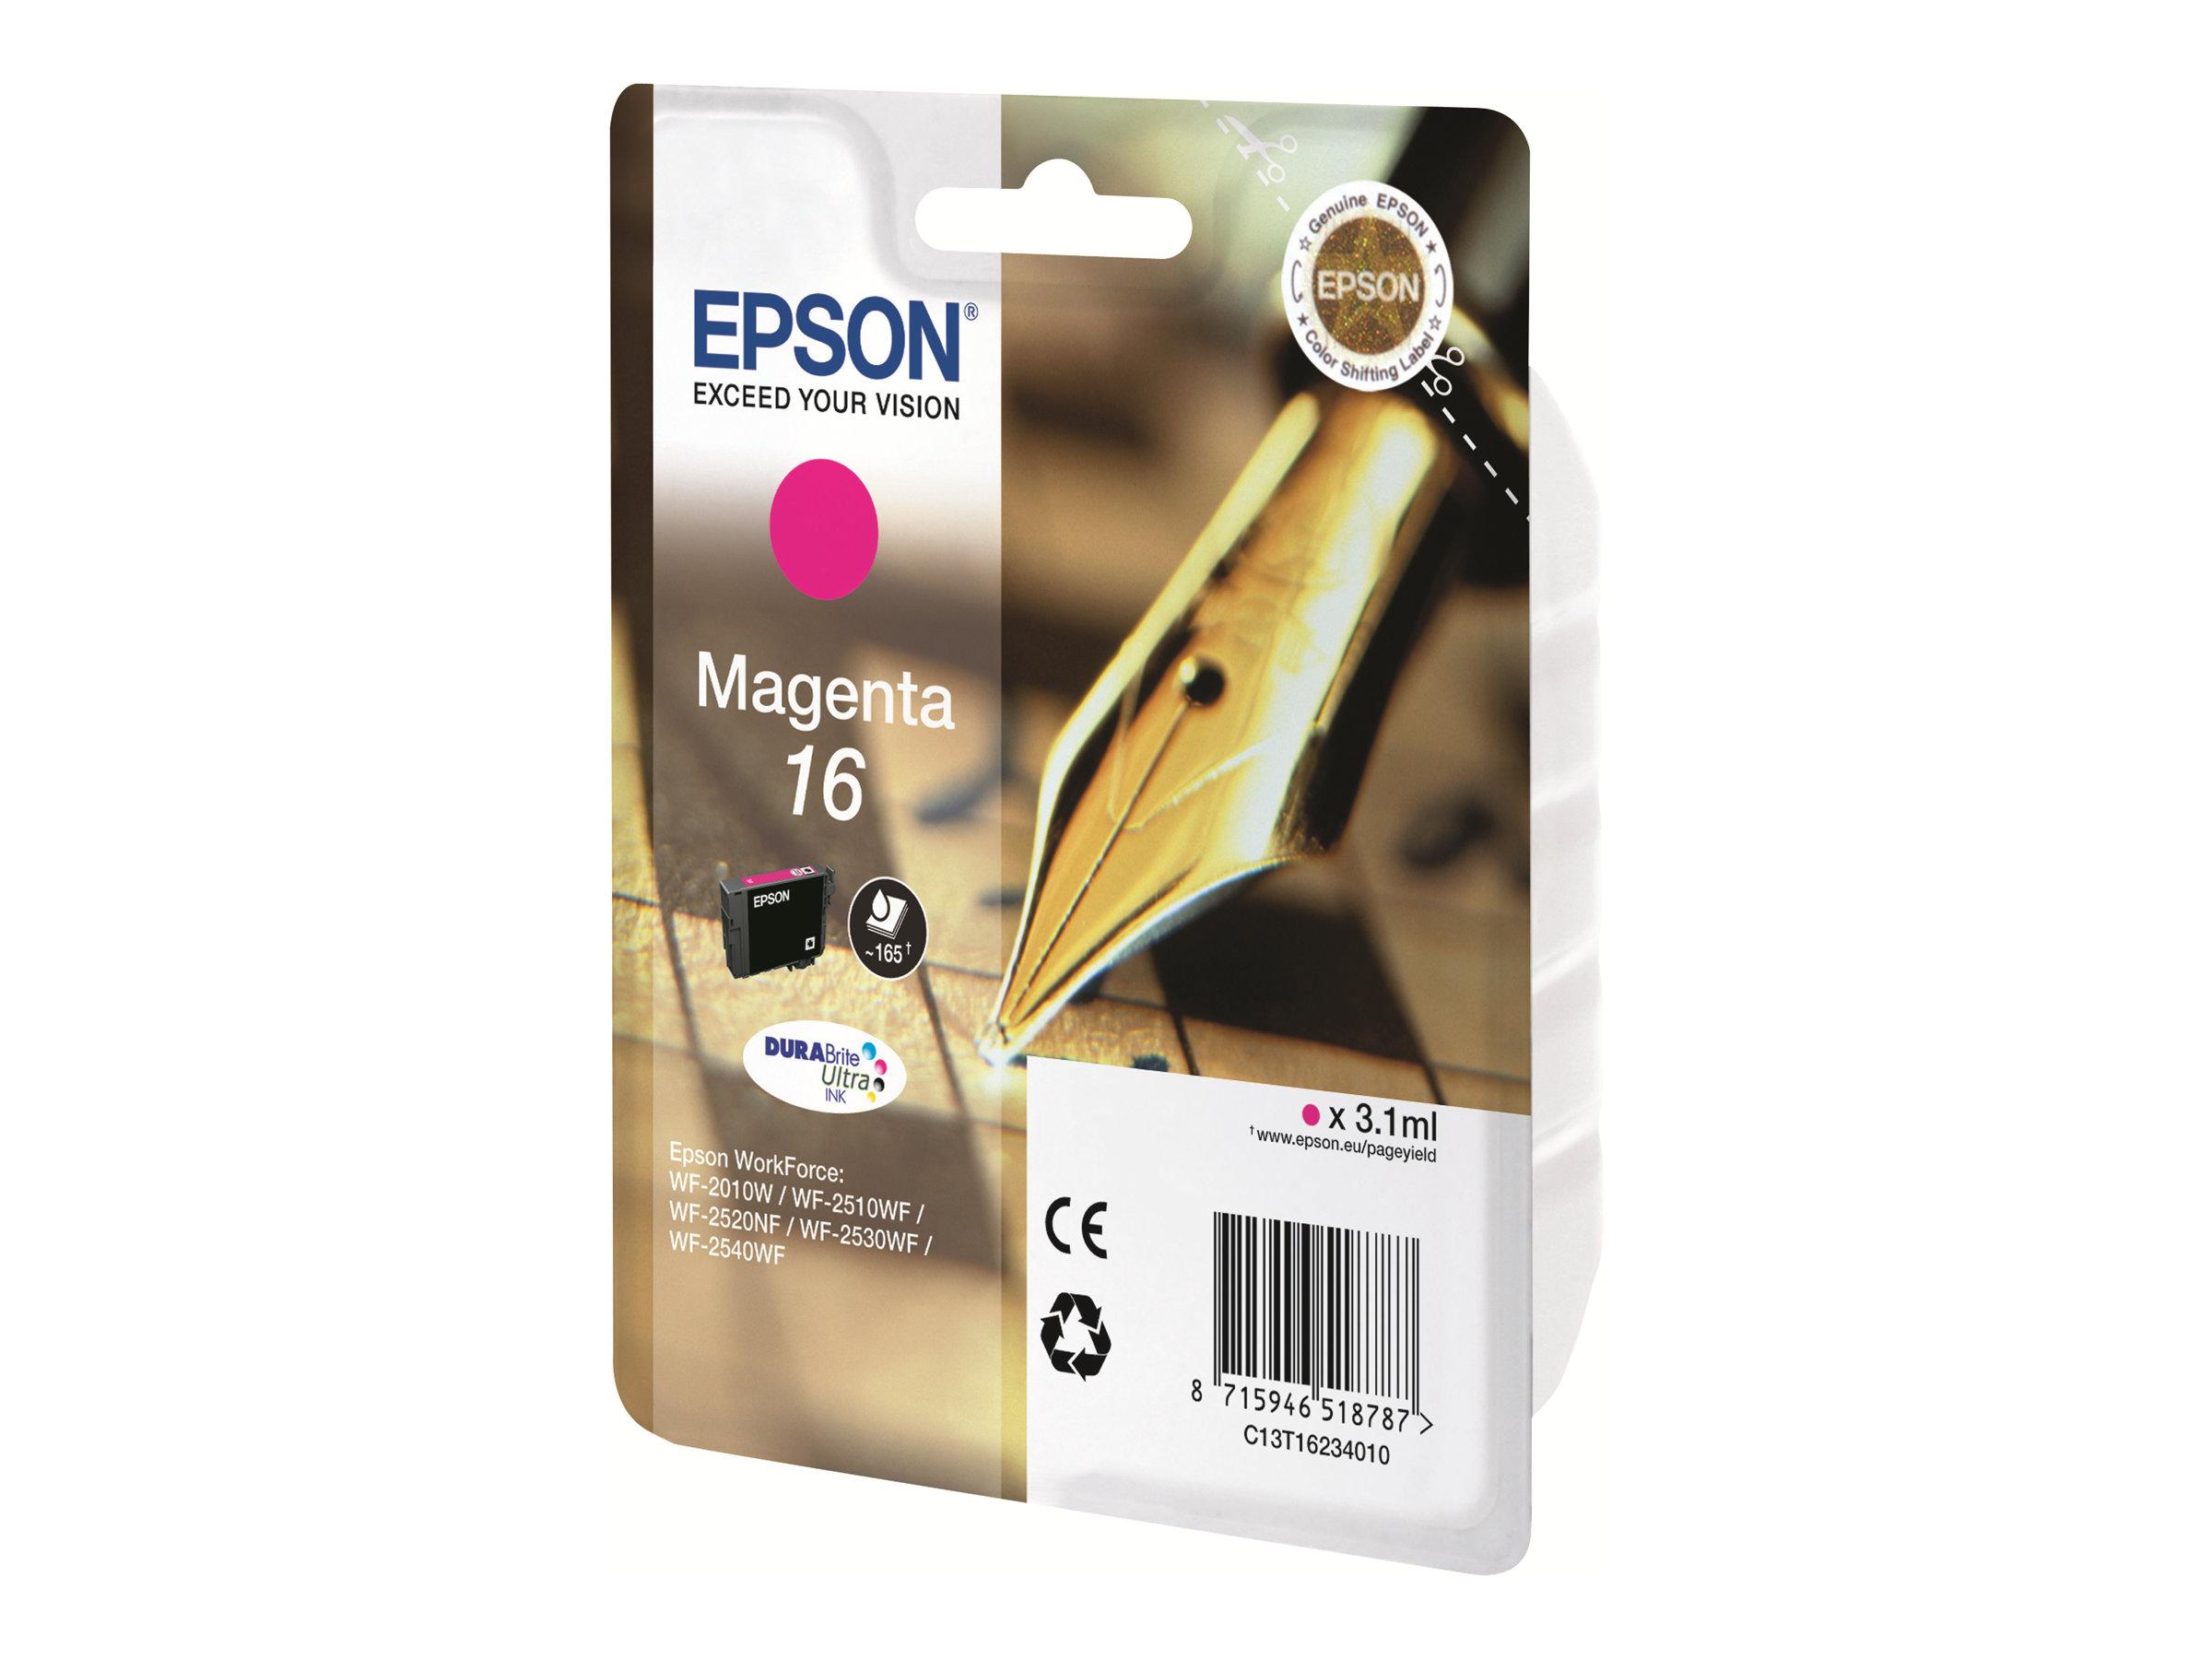 epson t16 stylo plume magenta originale cartouche d 39 encre epson. Black Bedroom Furniture Sets. Home Design Ideas